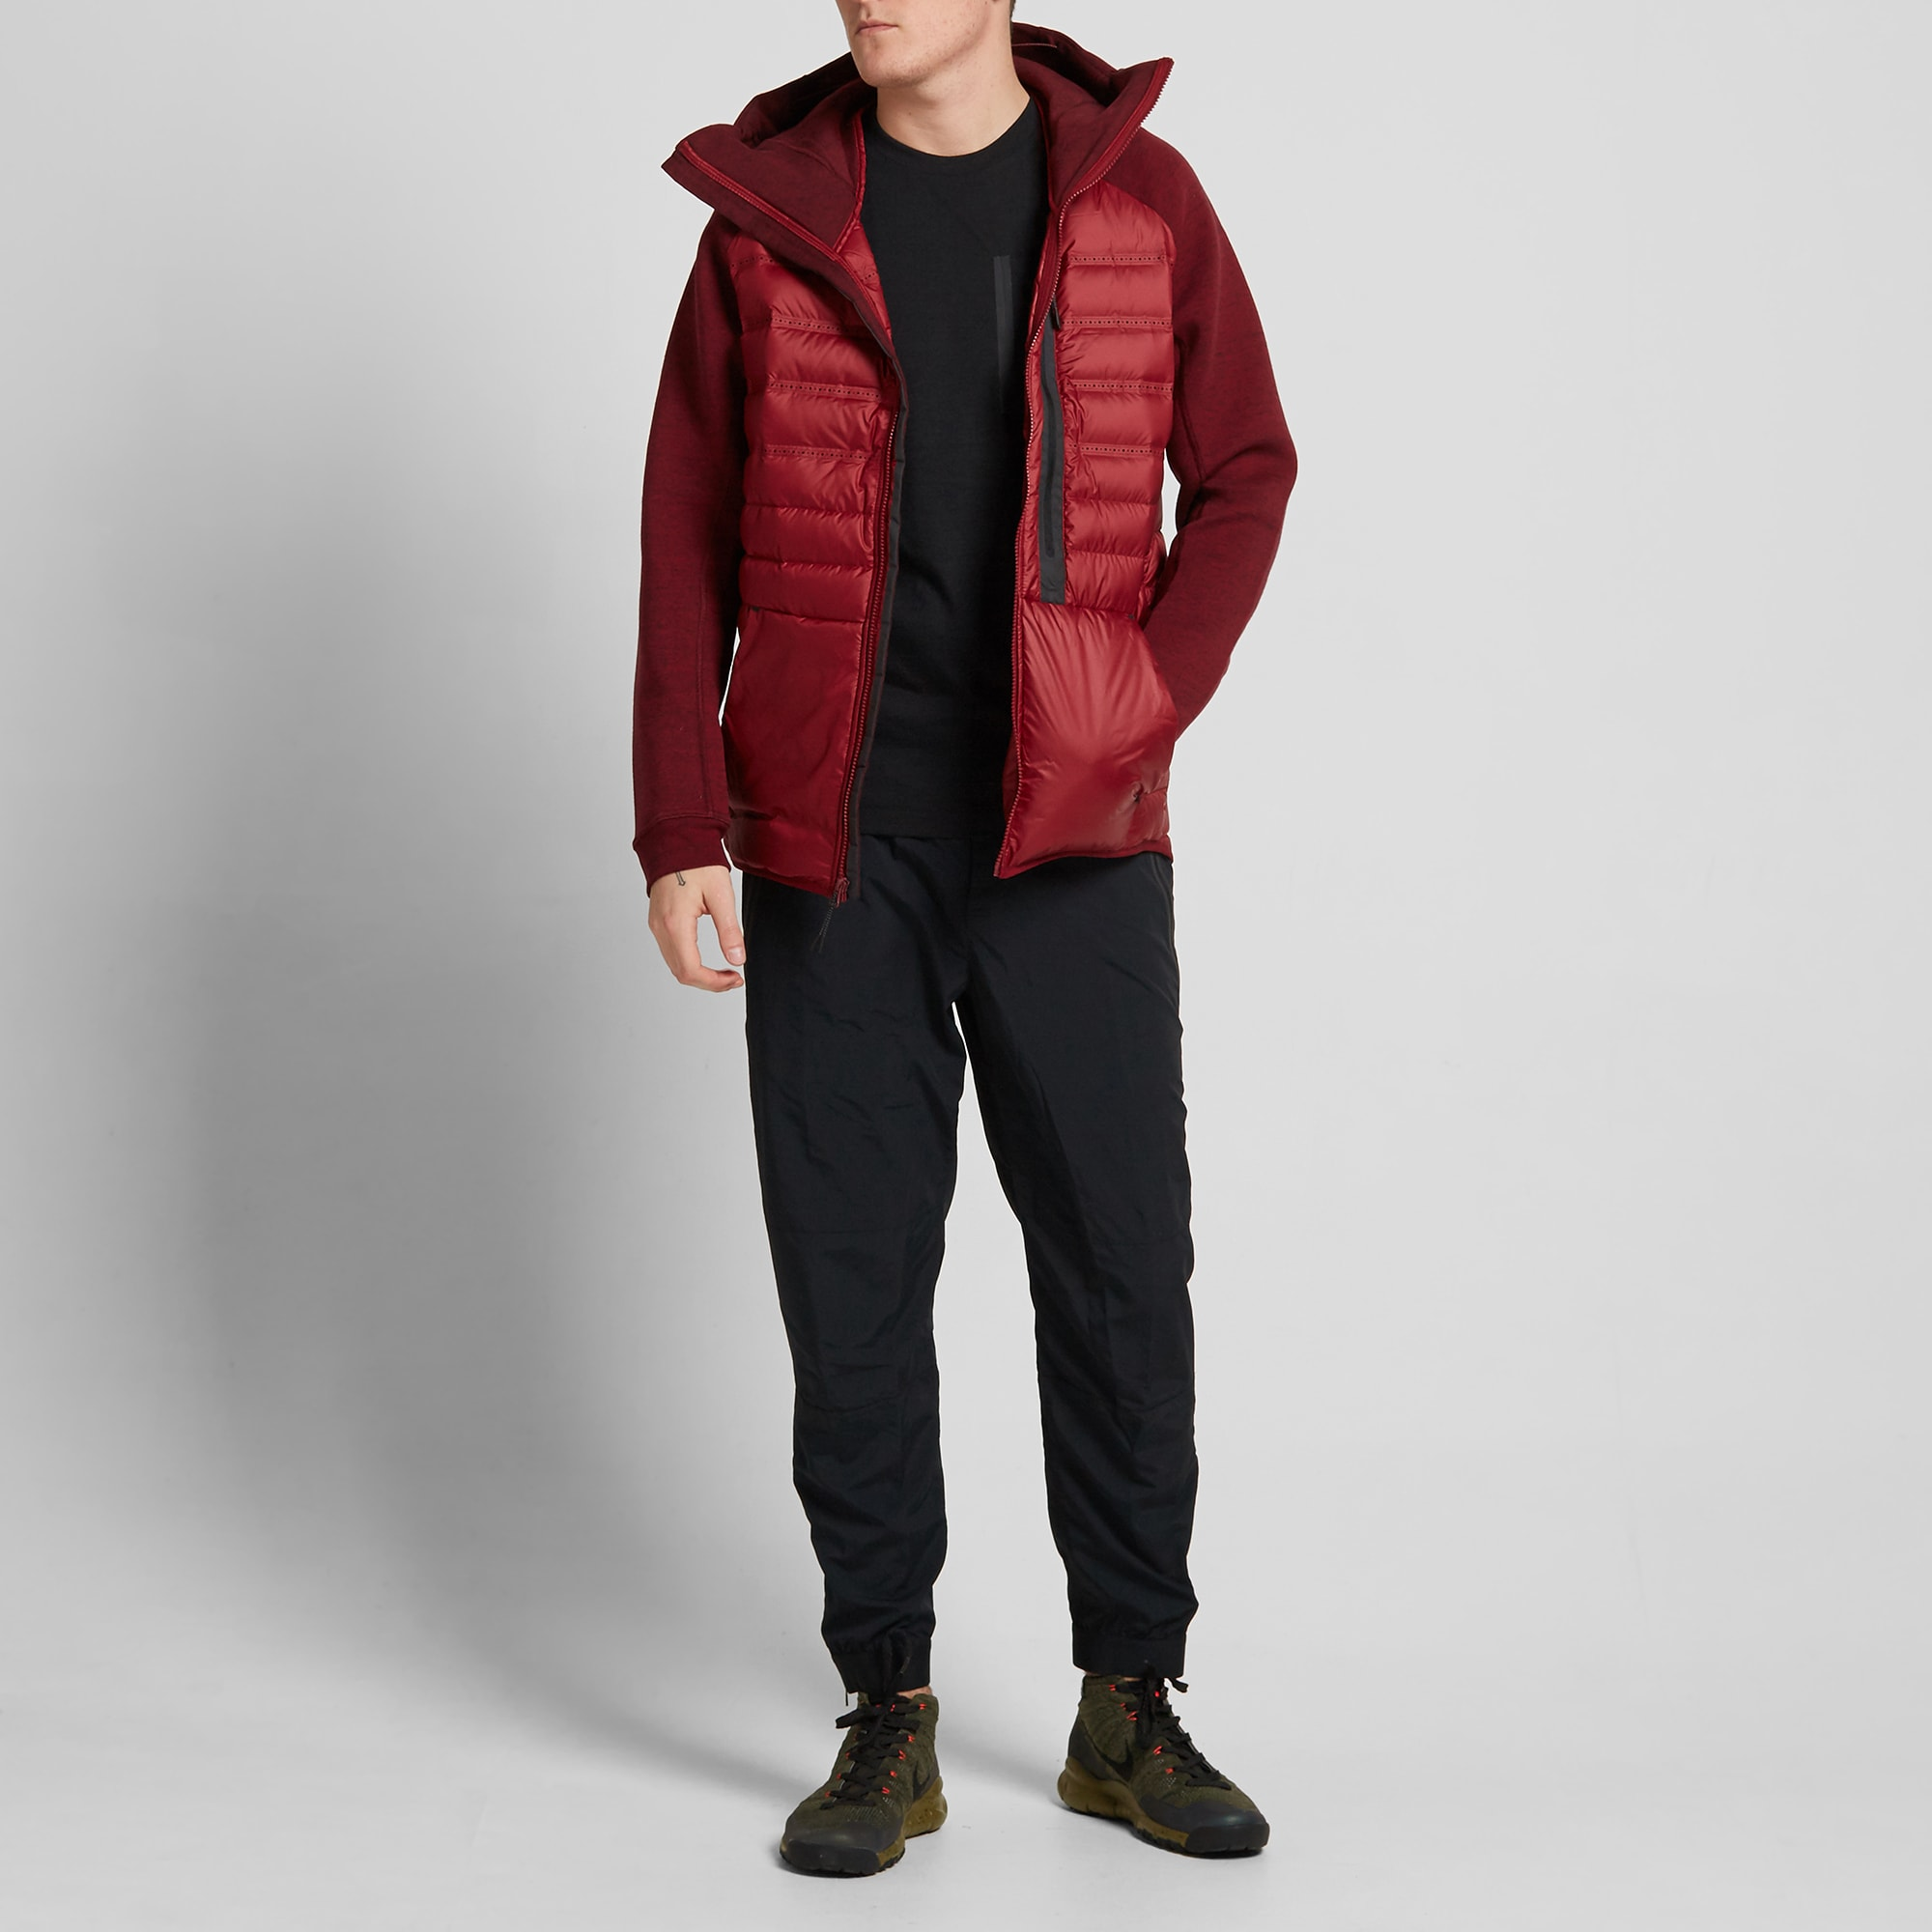 NIKE TECH Fleece AEROLOFT Jacket Men's Jacket Black 678261